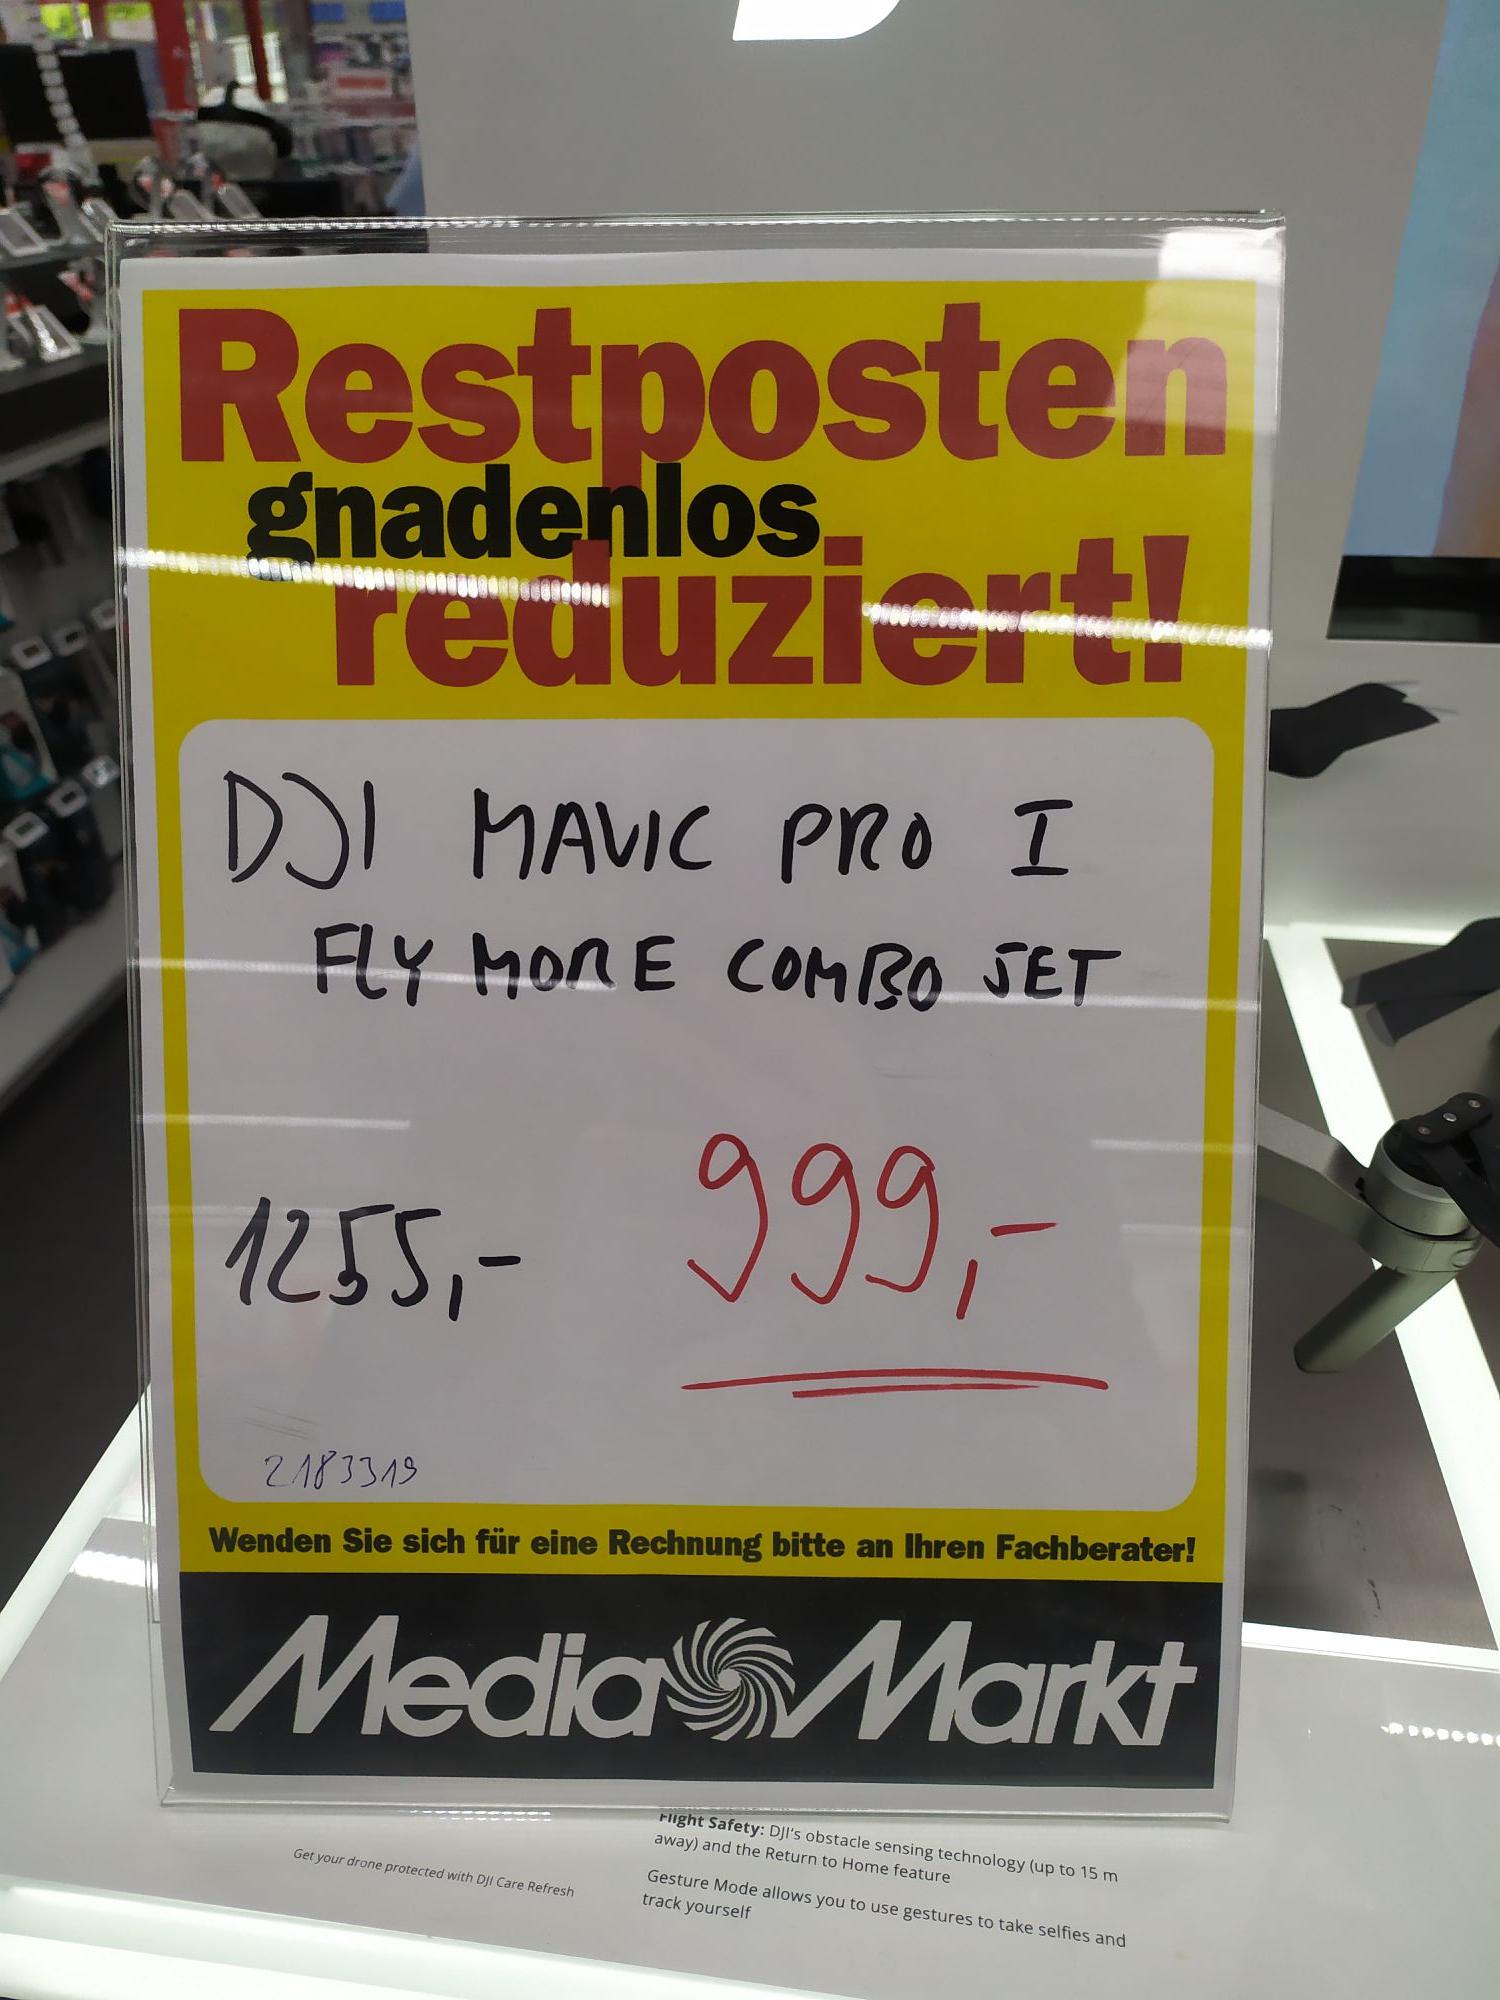 [lokal Mediamarkt Weinheim] DJI Mavic Pro - 1fly more Combo